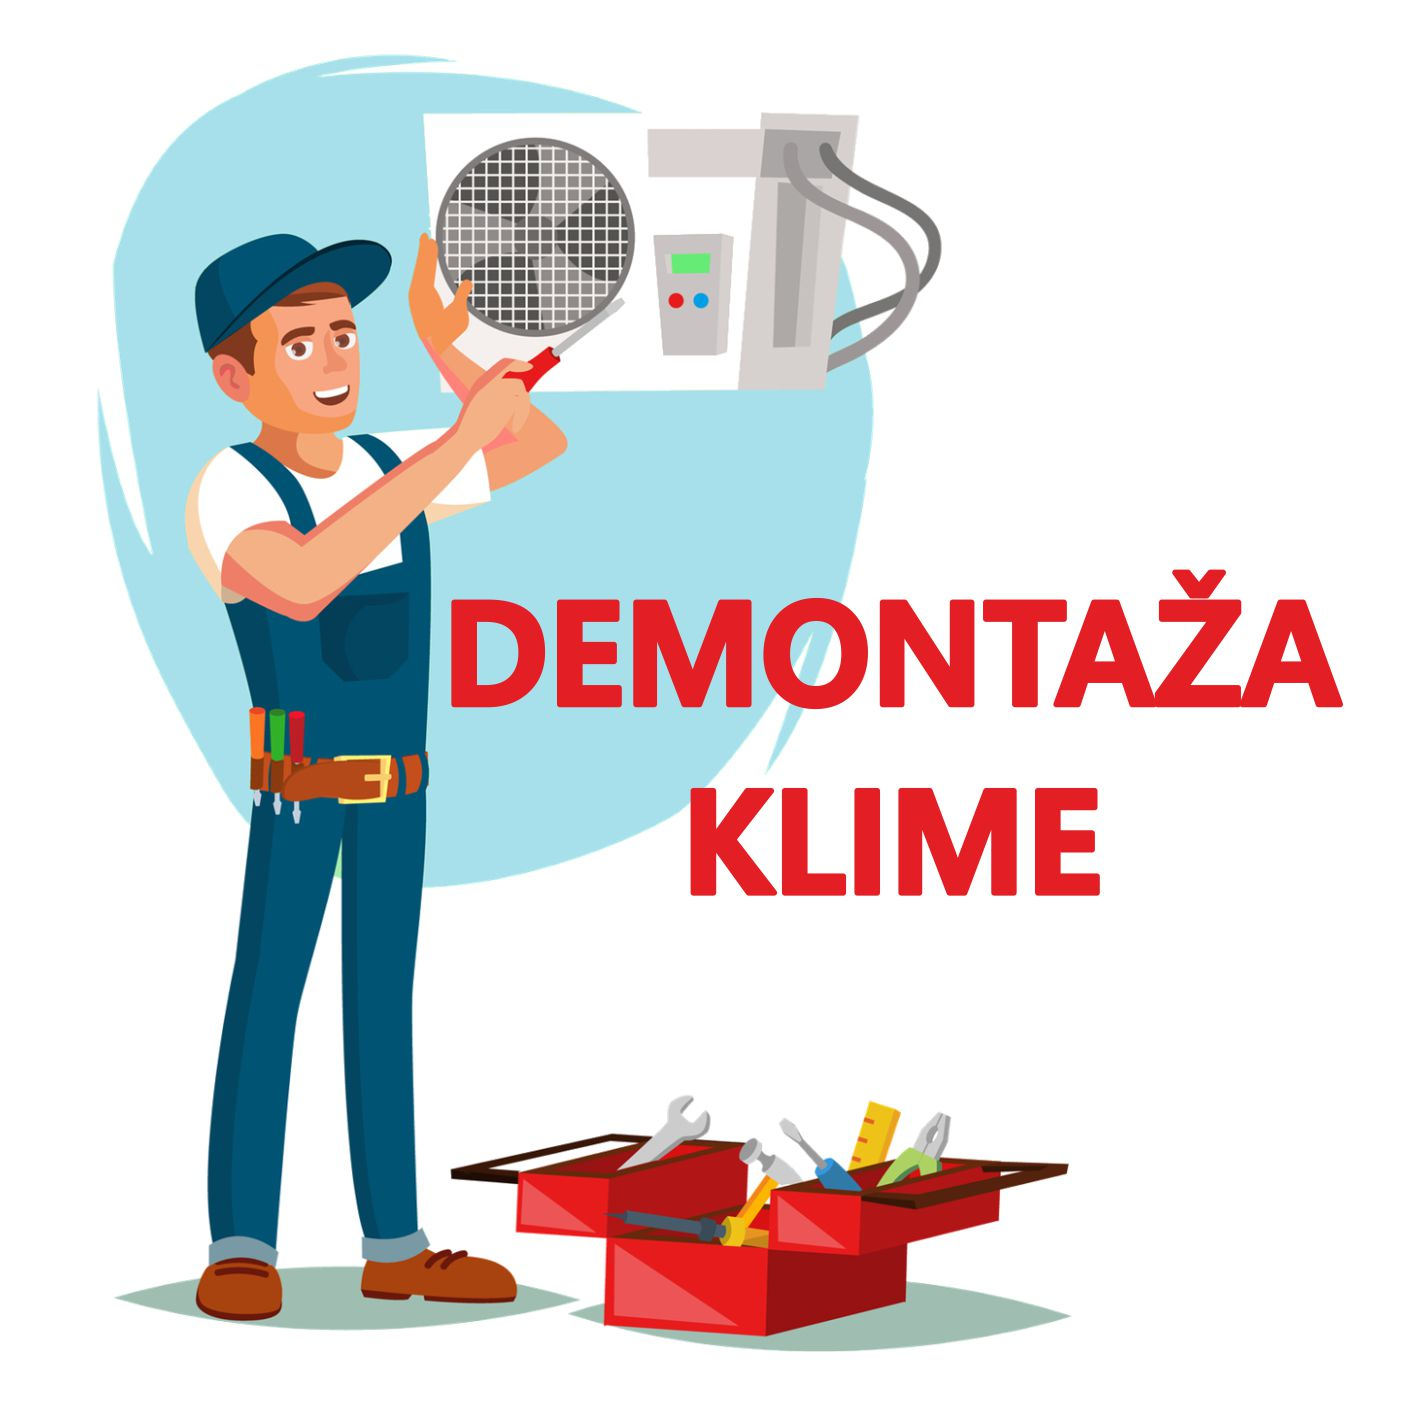 DEMONTAŽA KLIMA UREĐAJA SNAGE 4 - 6 kW